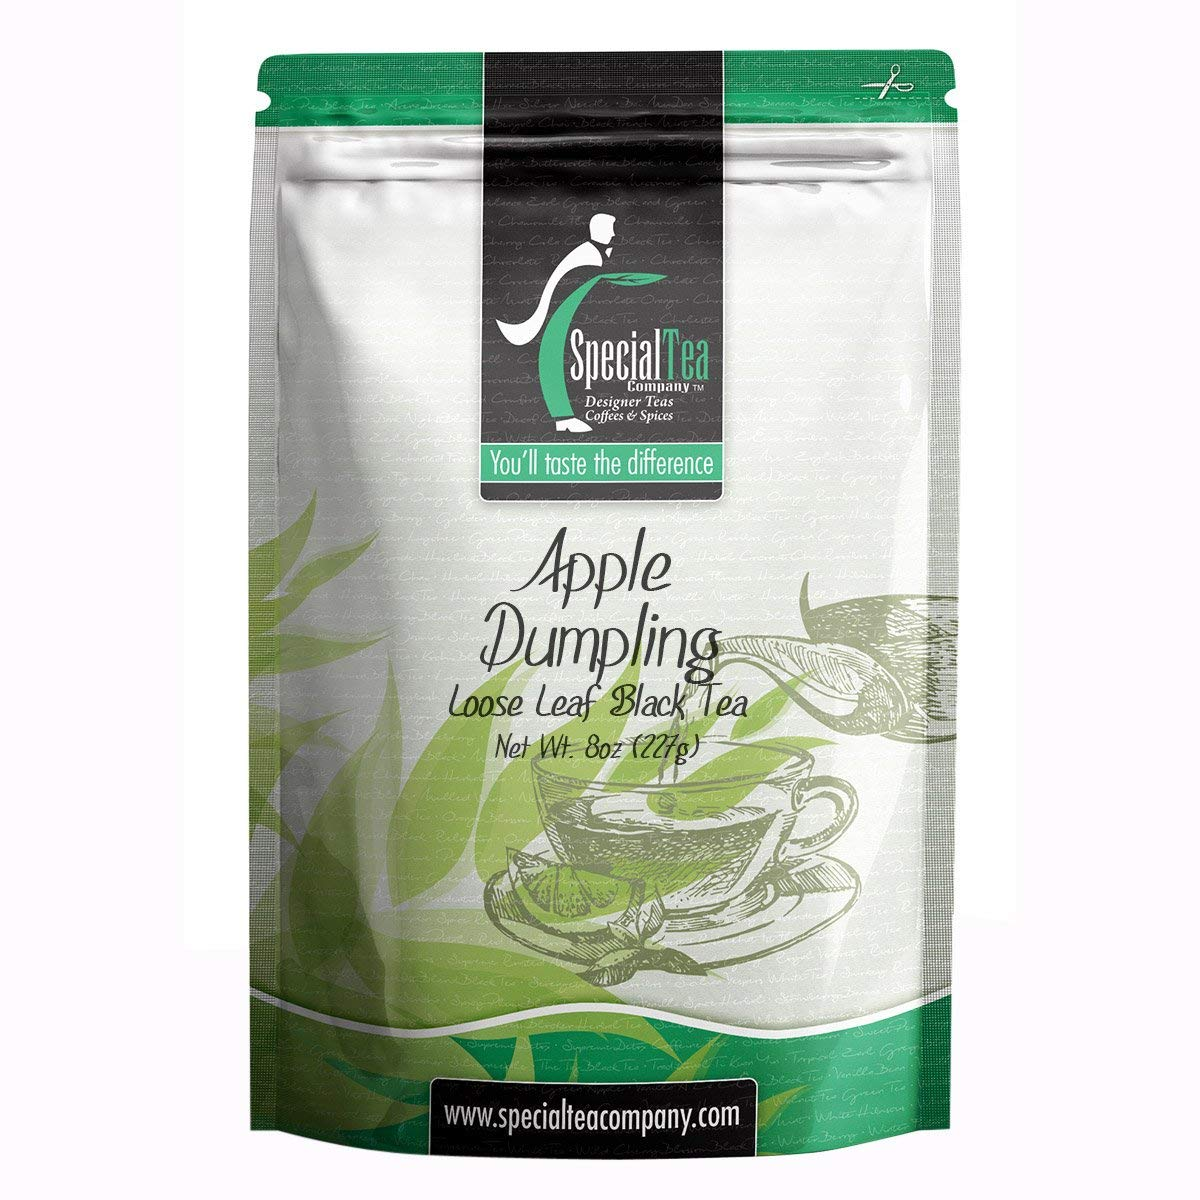 Special Tea Company Apple Dumpling Loose Leaf Black Tea, 8 oz.